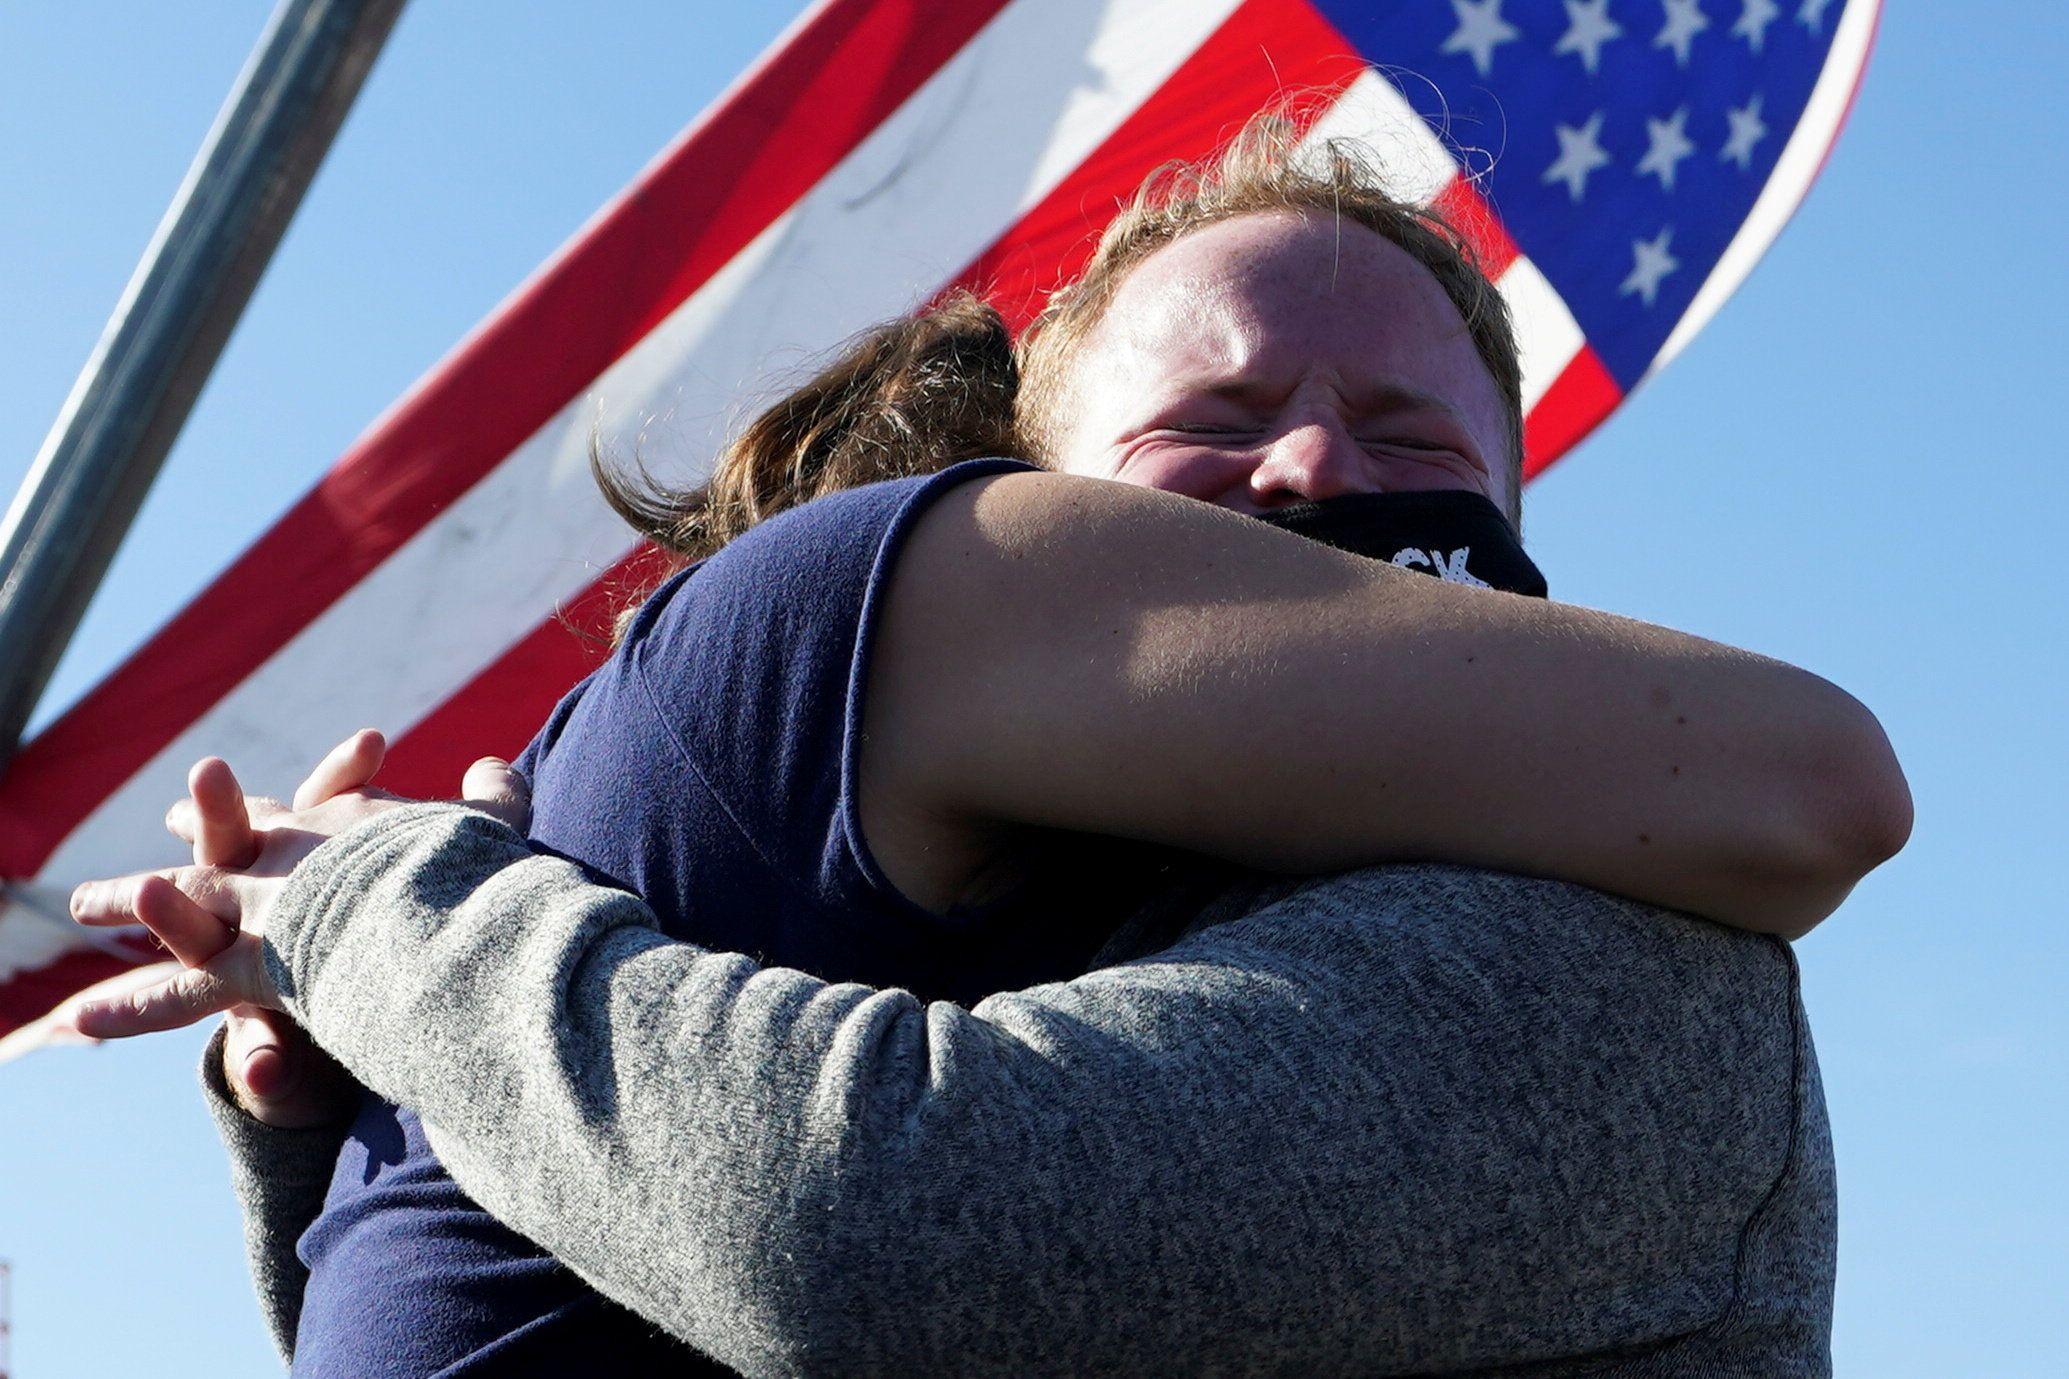 Supporters of Democratic U.S. presidential nominee Joe Biden embrace